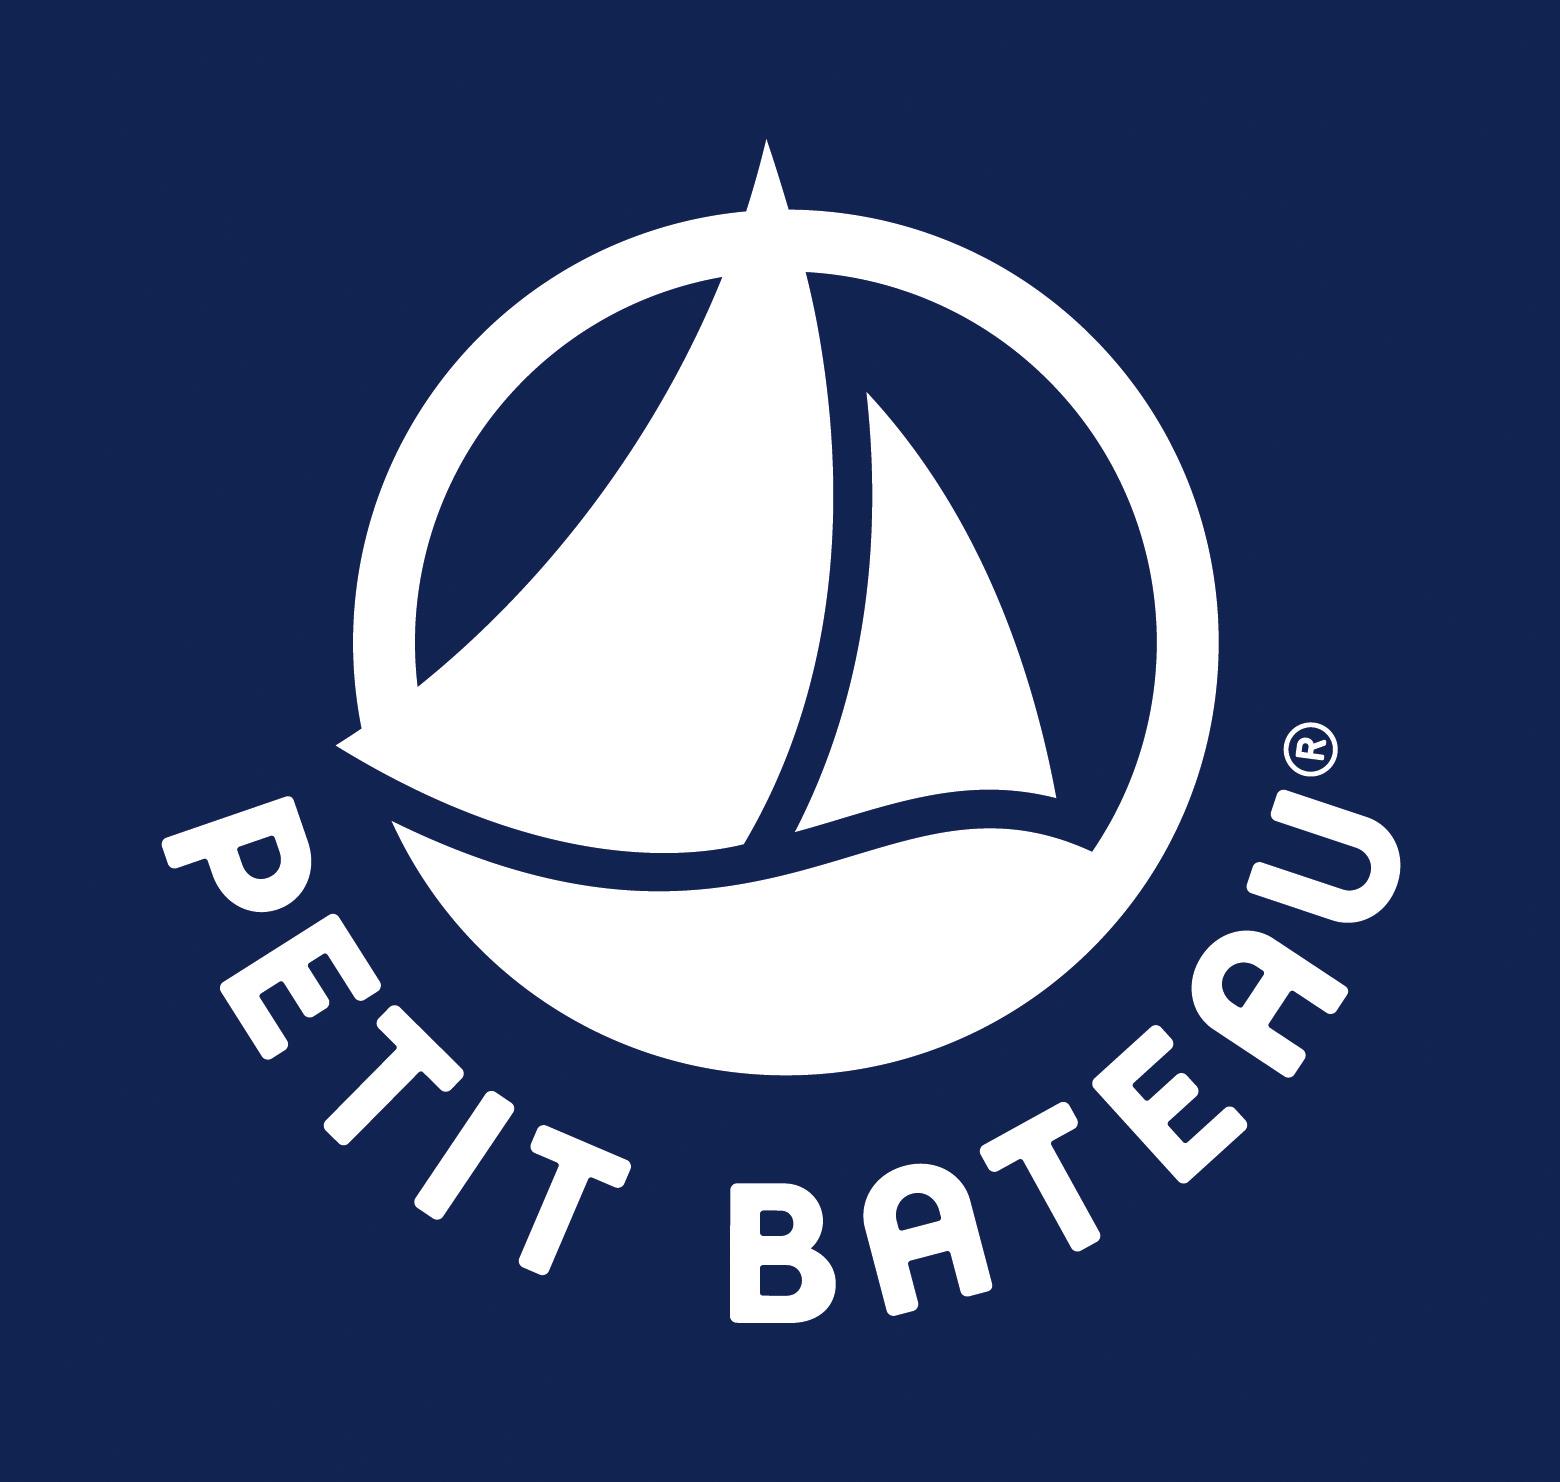 Petit bateau logo download free clipart with a transparent.